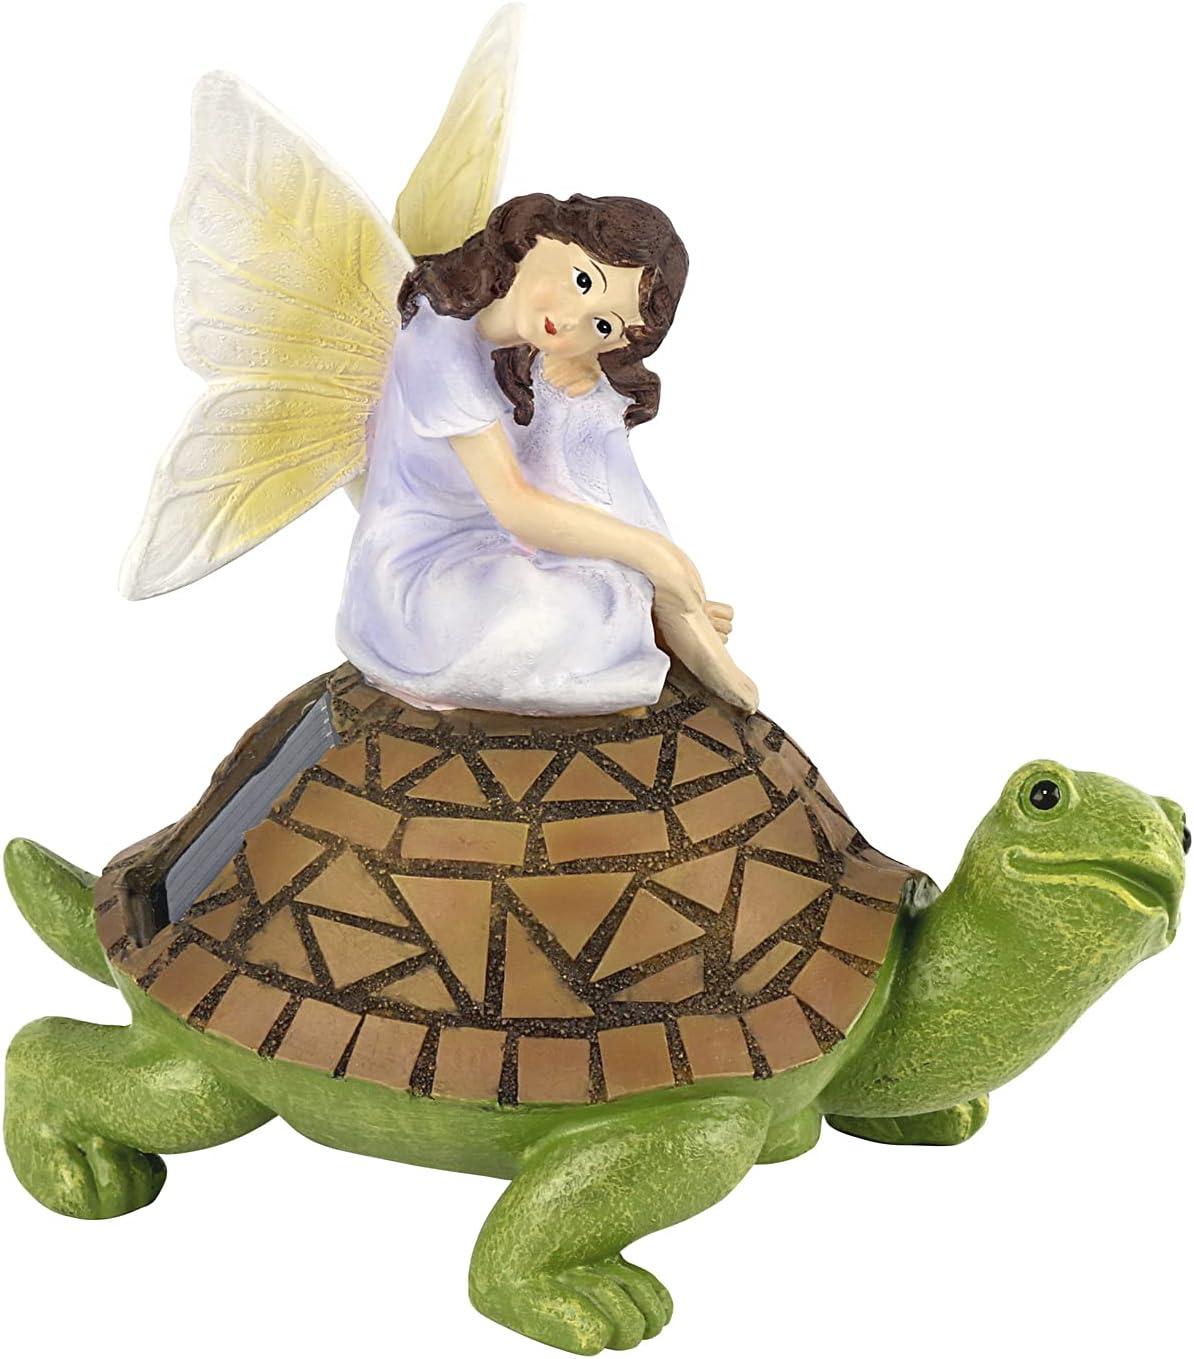 Seefun Garden Sitting Fairy Statue Solar Powered Resin Turtle Figurine Outdoor Decorative Animal Sculpture for Patio, 7 x 7.5 Inch